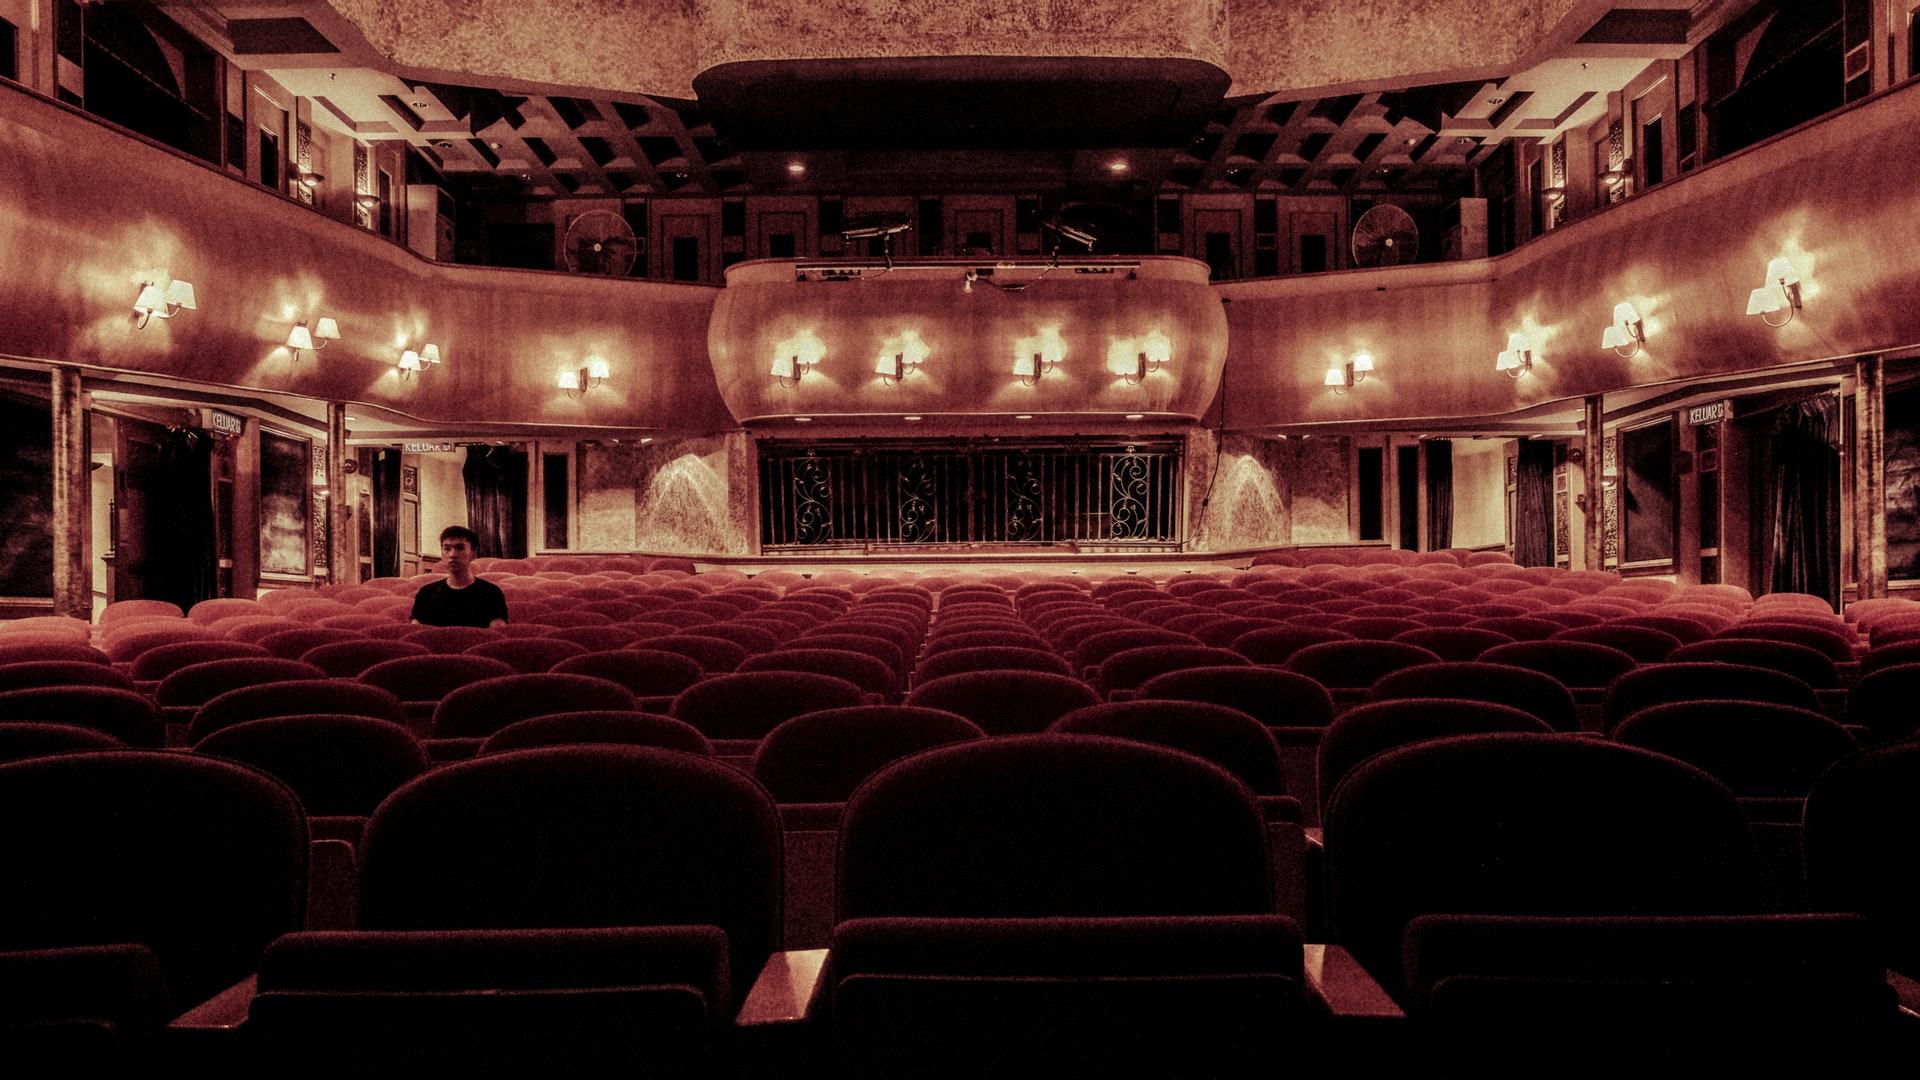 Westchester Broadway Theatre: Broadway Shows, Dinner